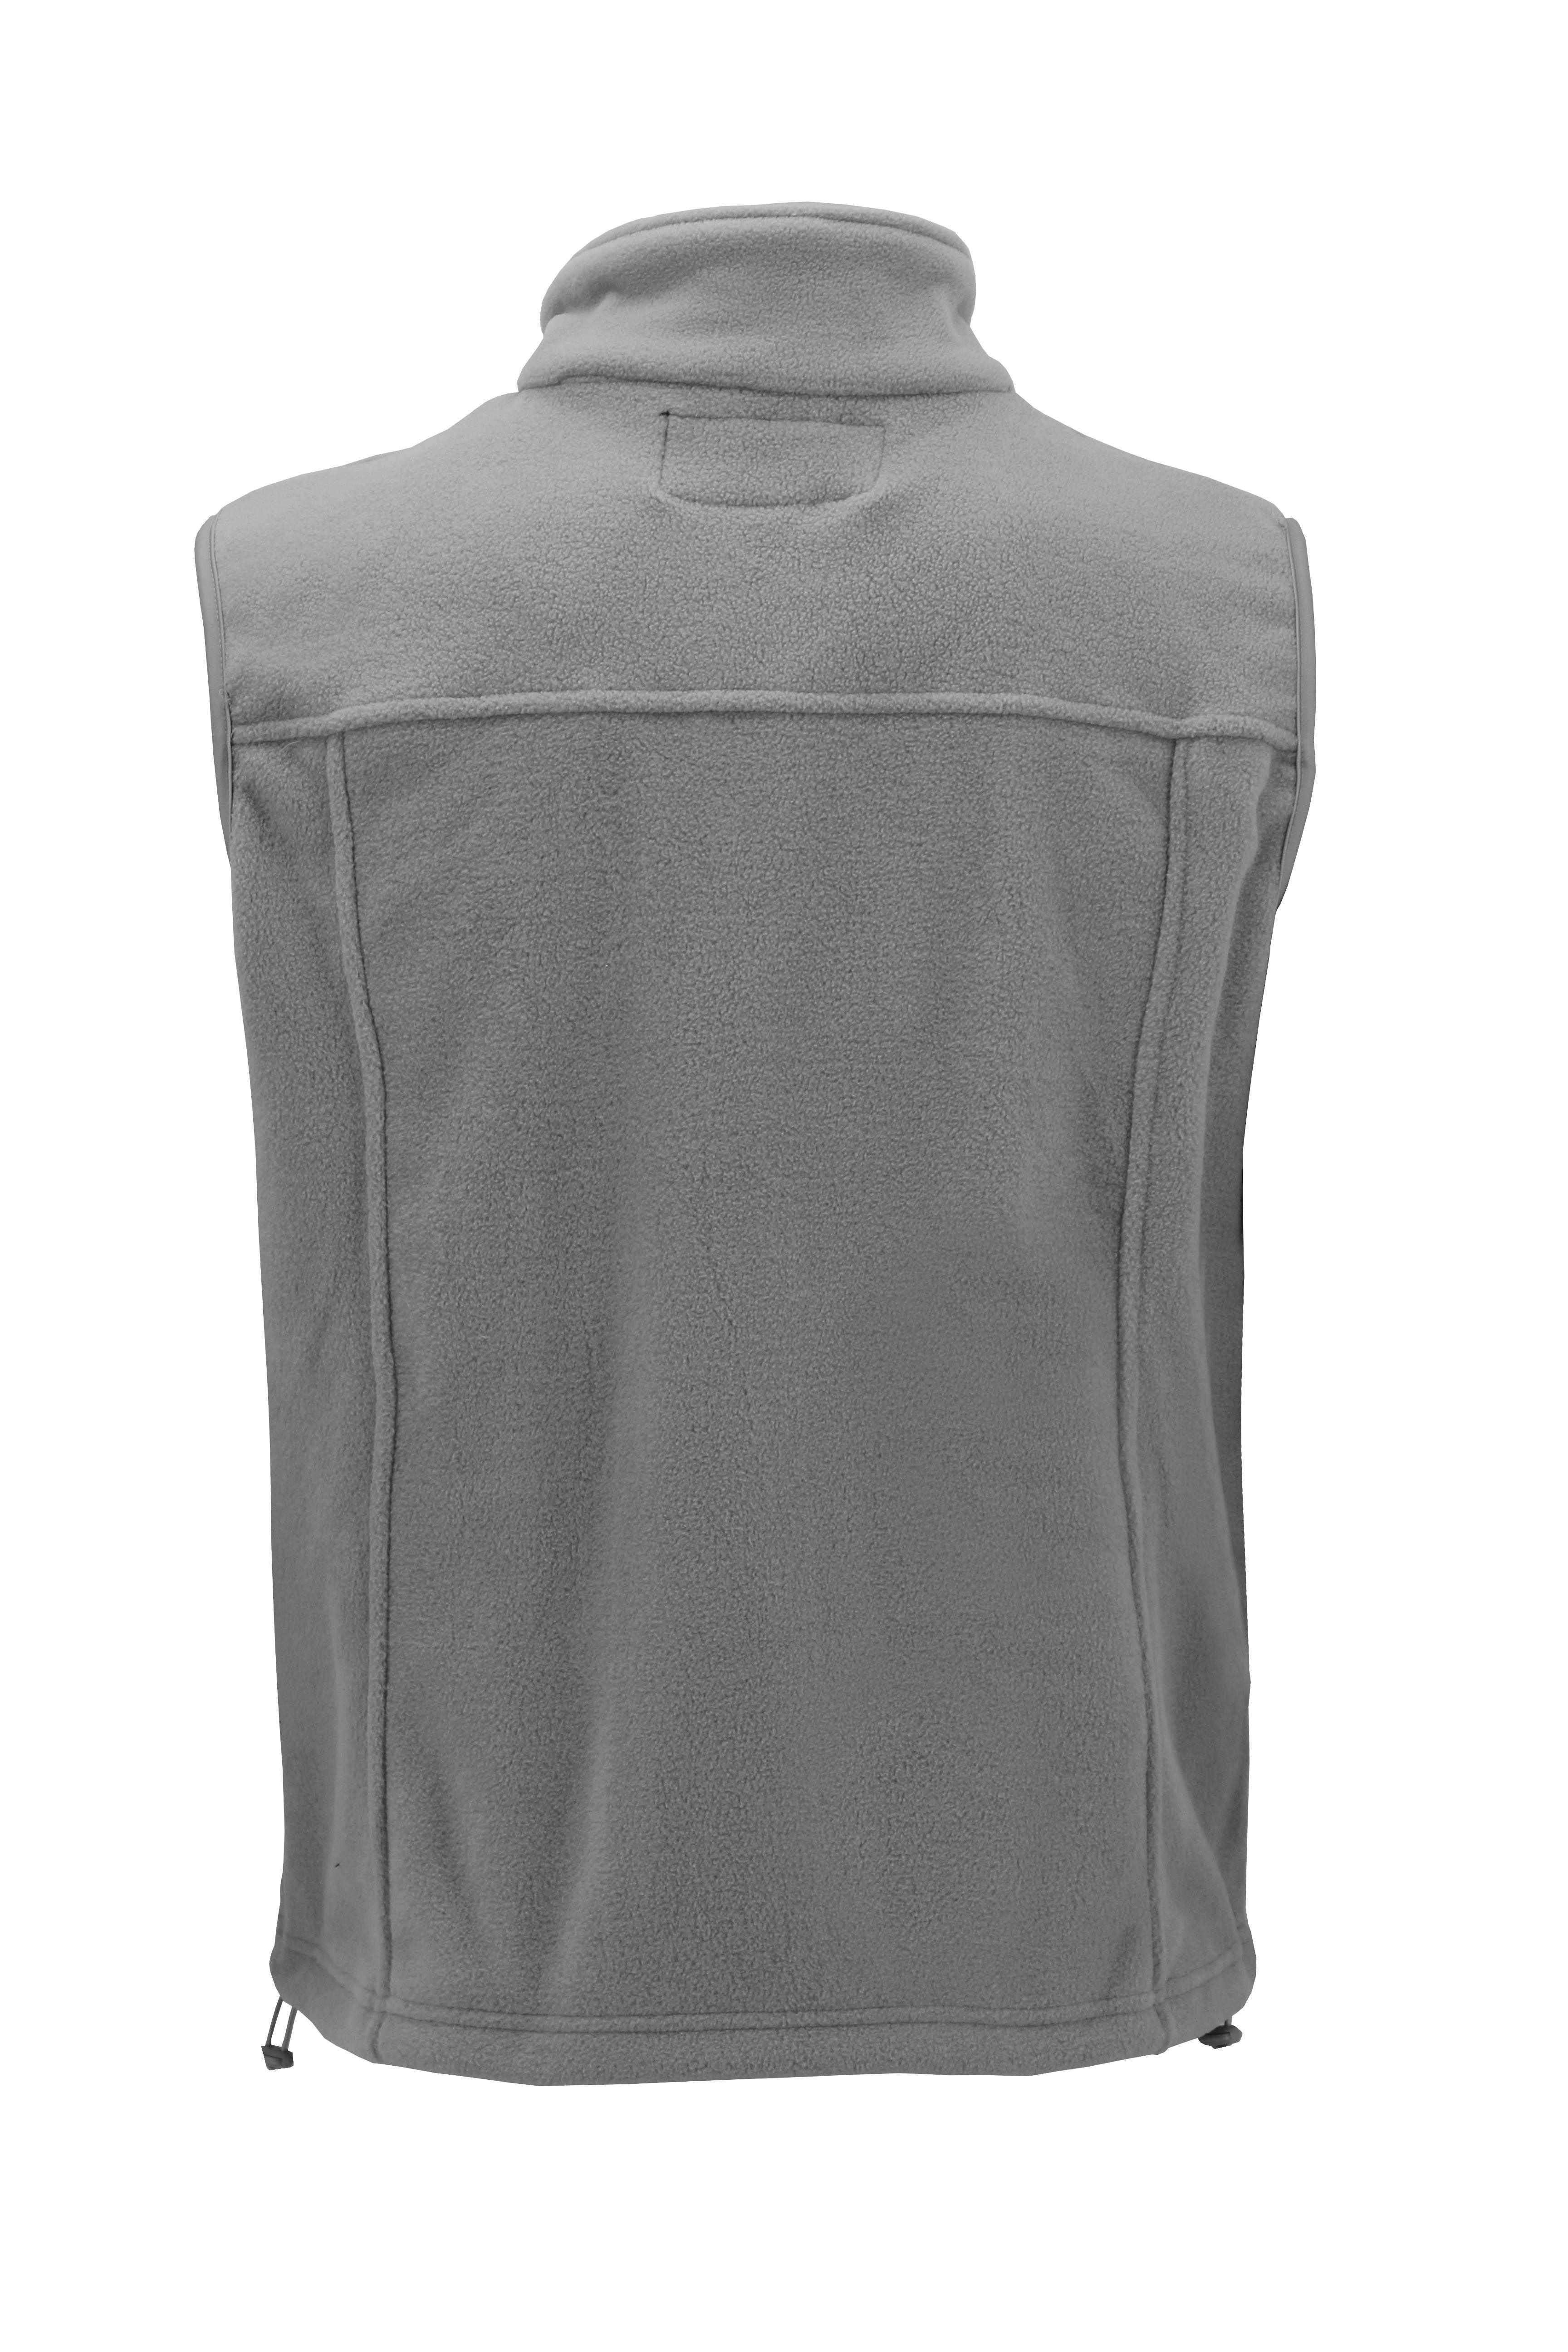 miniature 3 - Men-039-s-Polar-Fleece-Lightweight-Warm-Jacket-Collared-Full-Zip-Up-Sweater-Vest